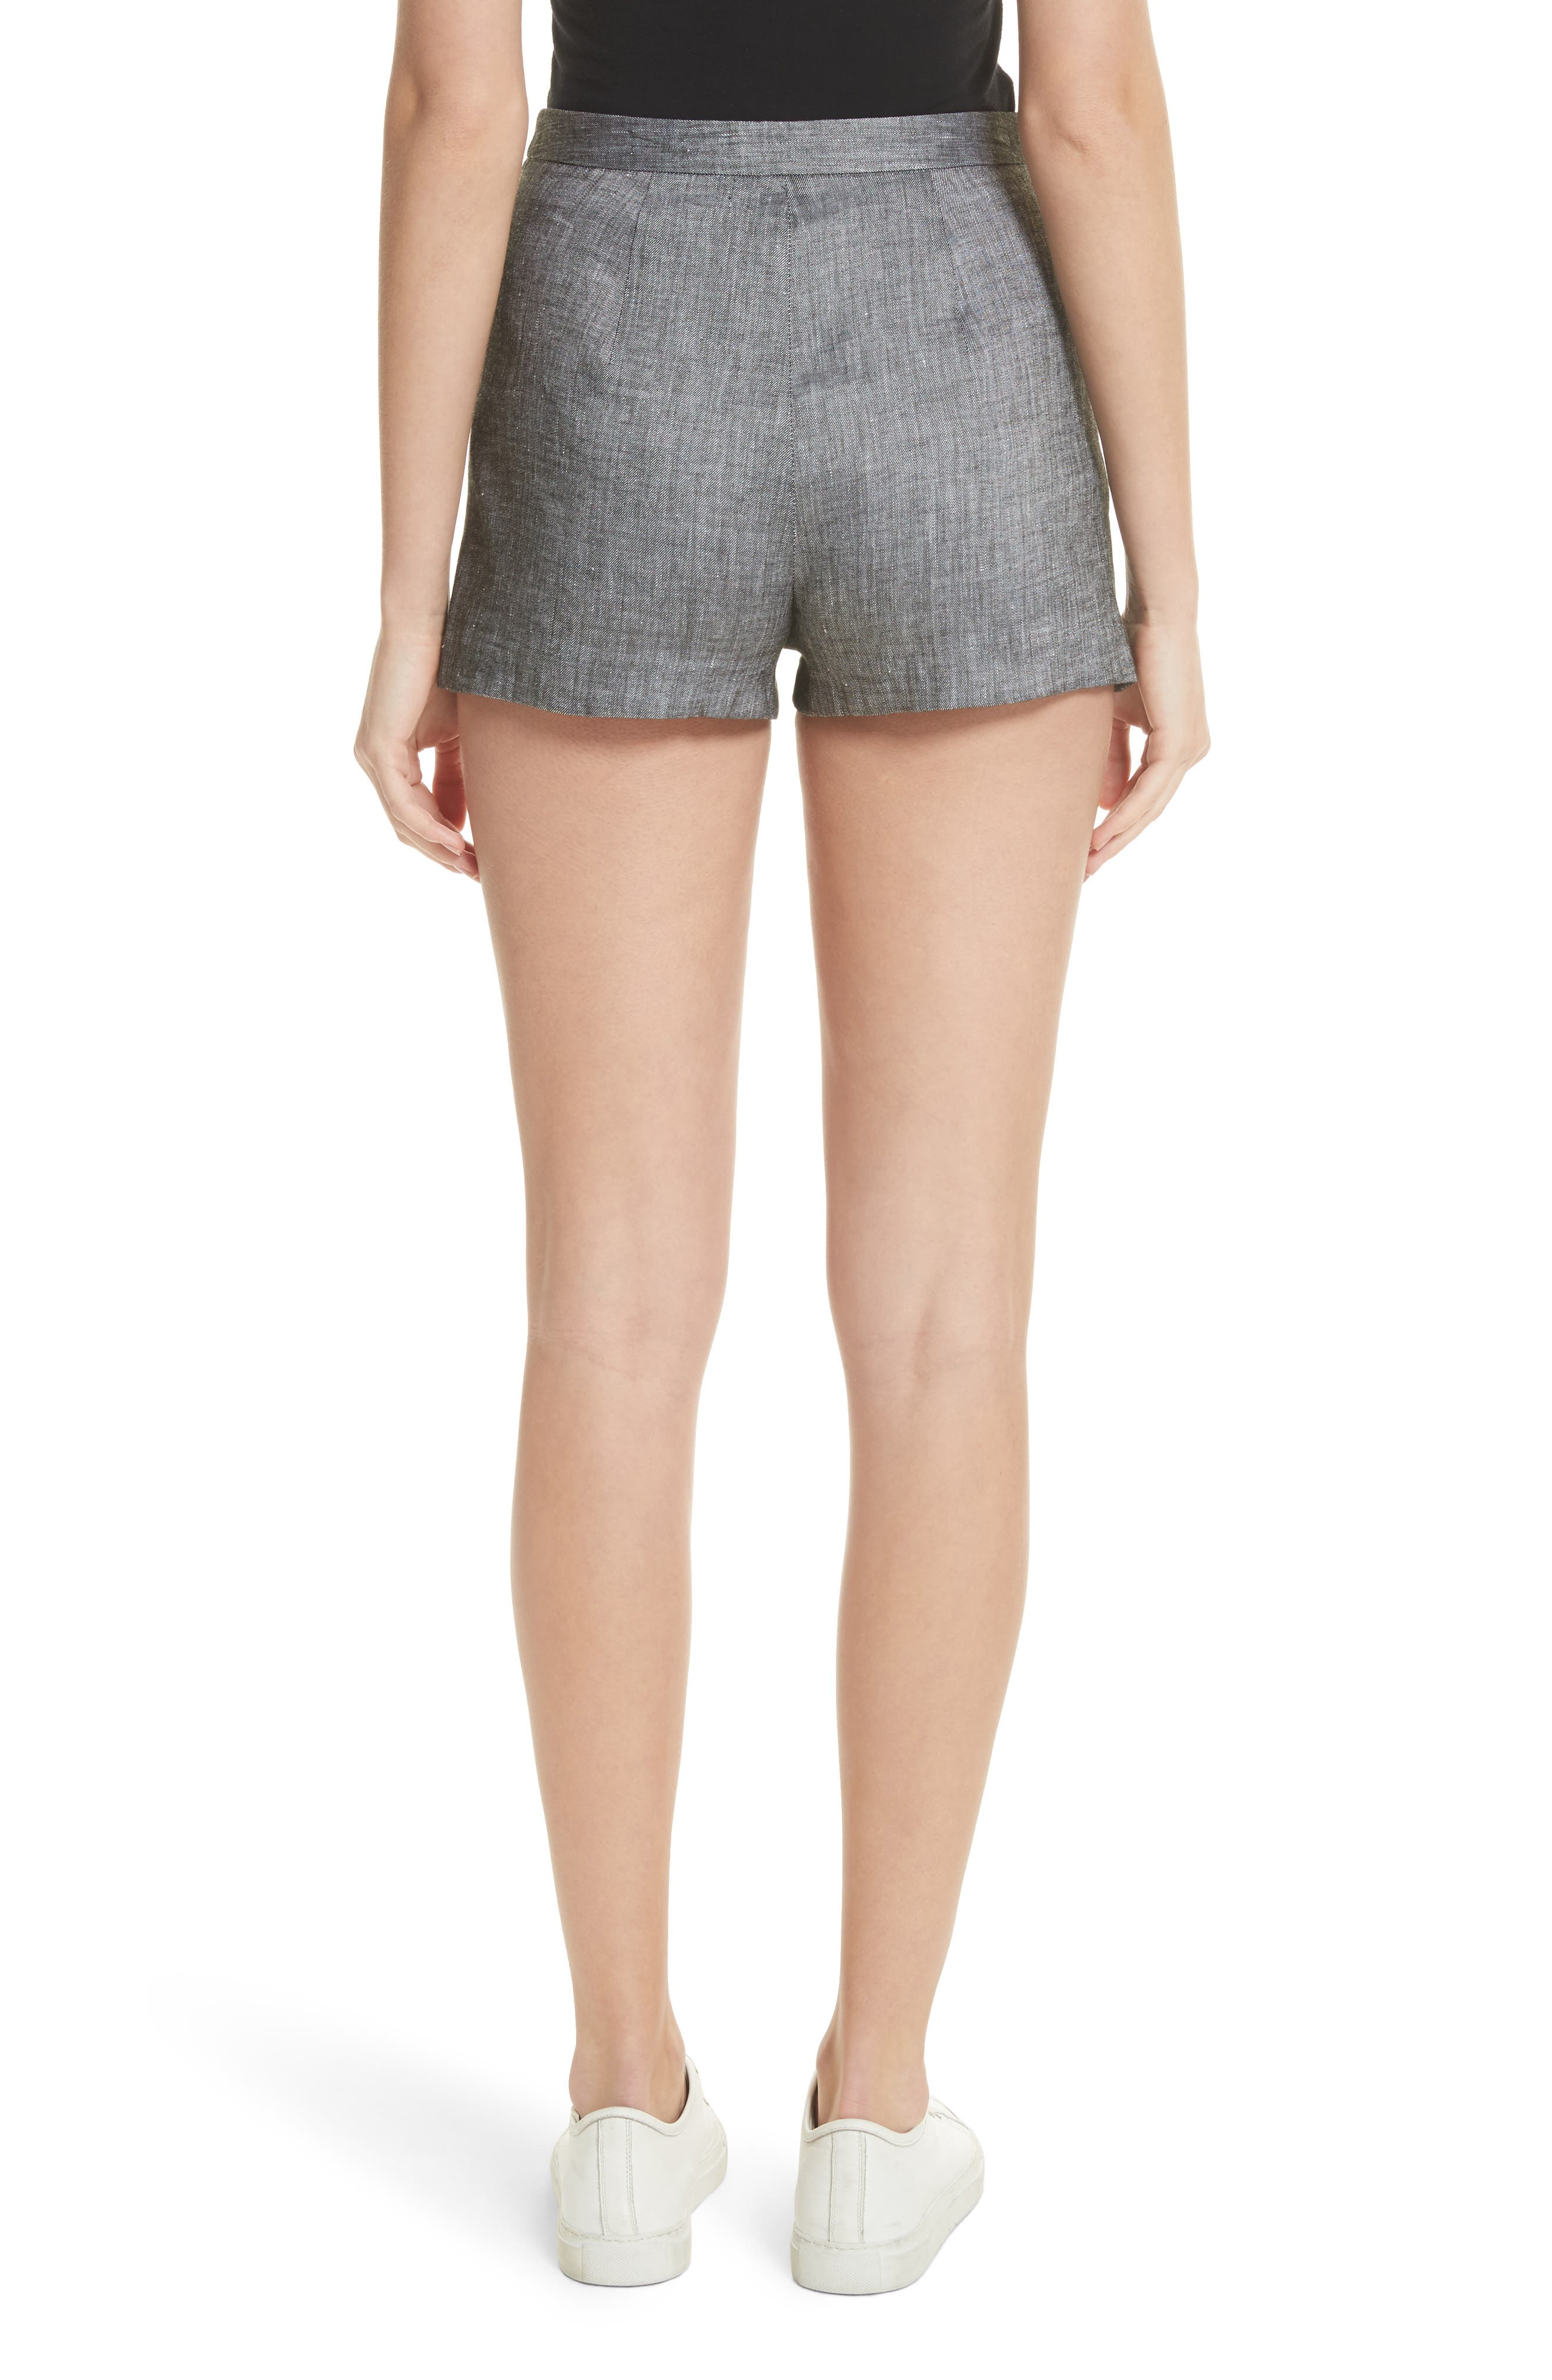 Trudee High Waist Shorts,                             Alternate thumbnail 2, color,                             309